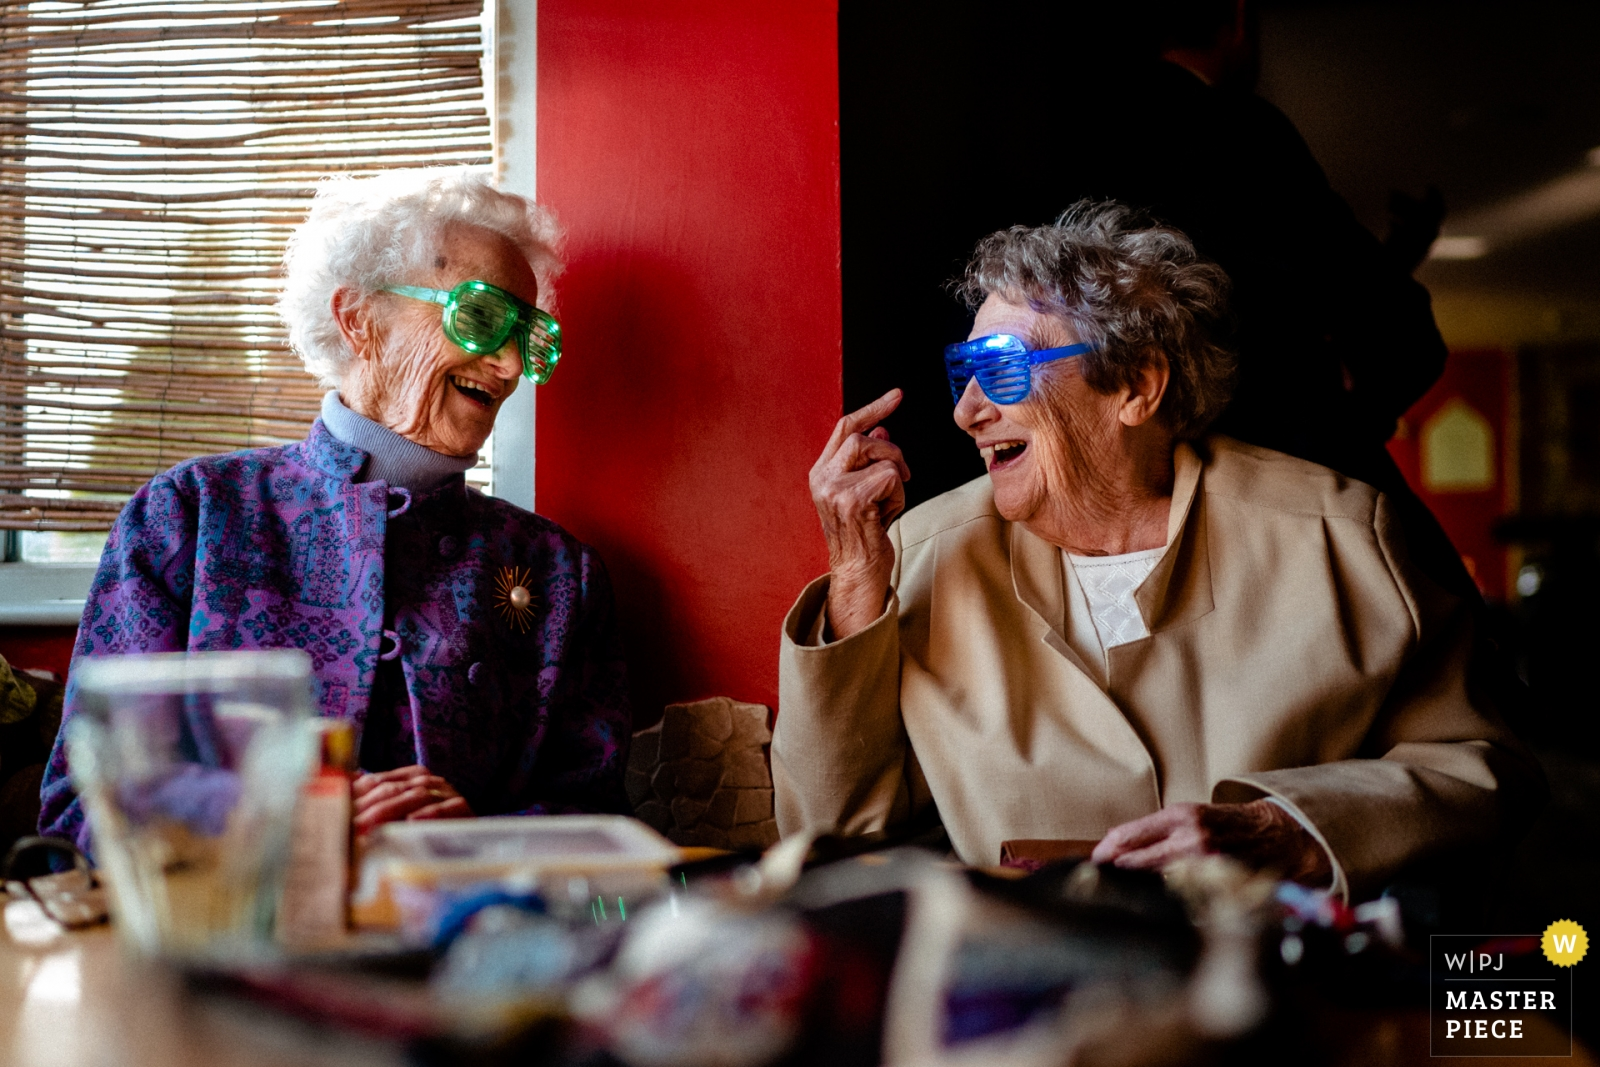 Grandmas in glasses - Hertfordshire, England Wedding Photography -  | The Mussing Sock, Cambridge, UK